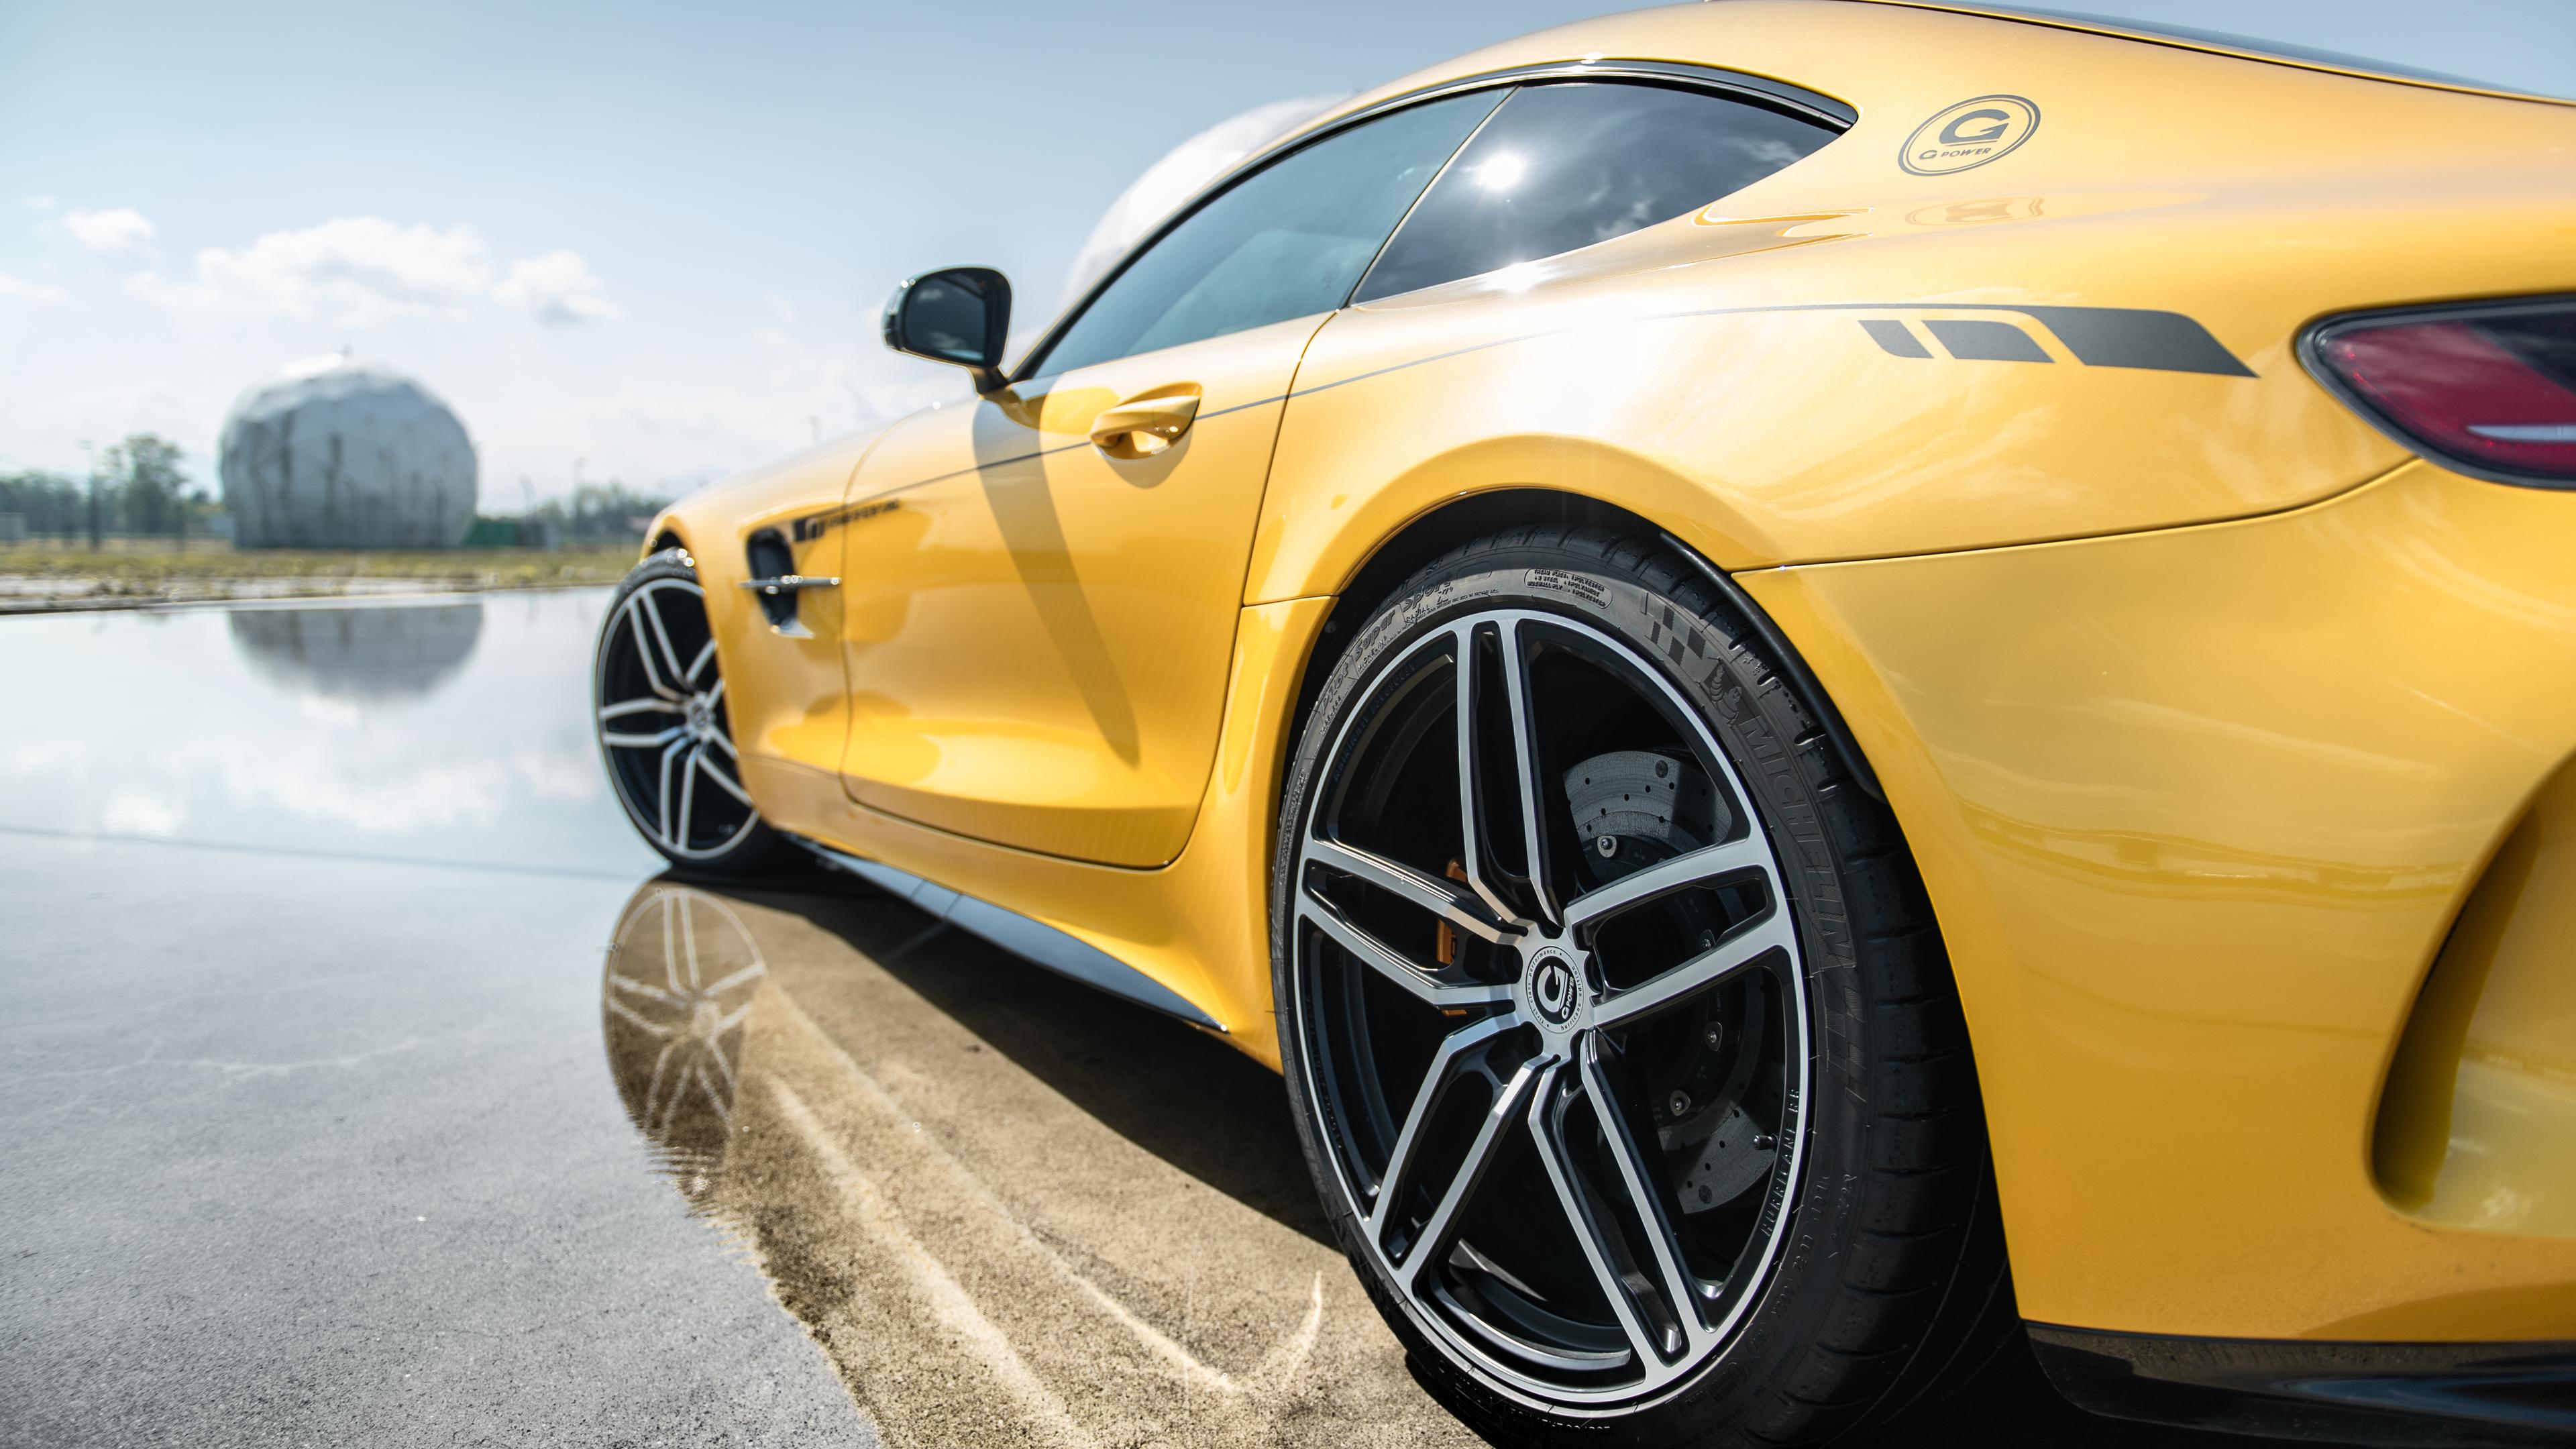 g power mercedes amg gt 2019 1562107980 - G Power Mercedes AMG GT 2019 - mercedes wallpapers, mercedes benz wallpapers, hd-wallpapers, cars wallpapers, amg wallpapers, 5k wallpapers, 4k-wallpapers, 2019 cars wallpapers